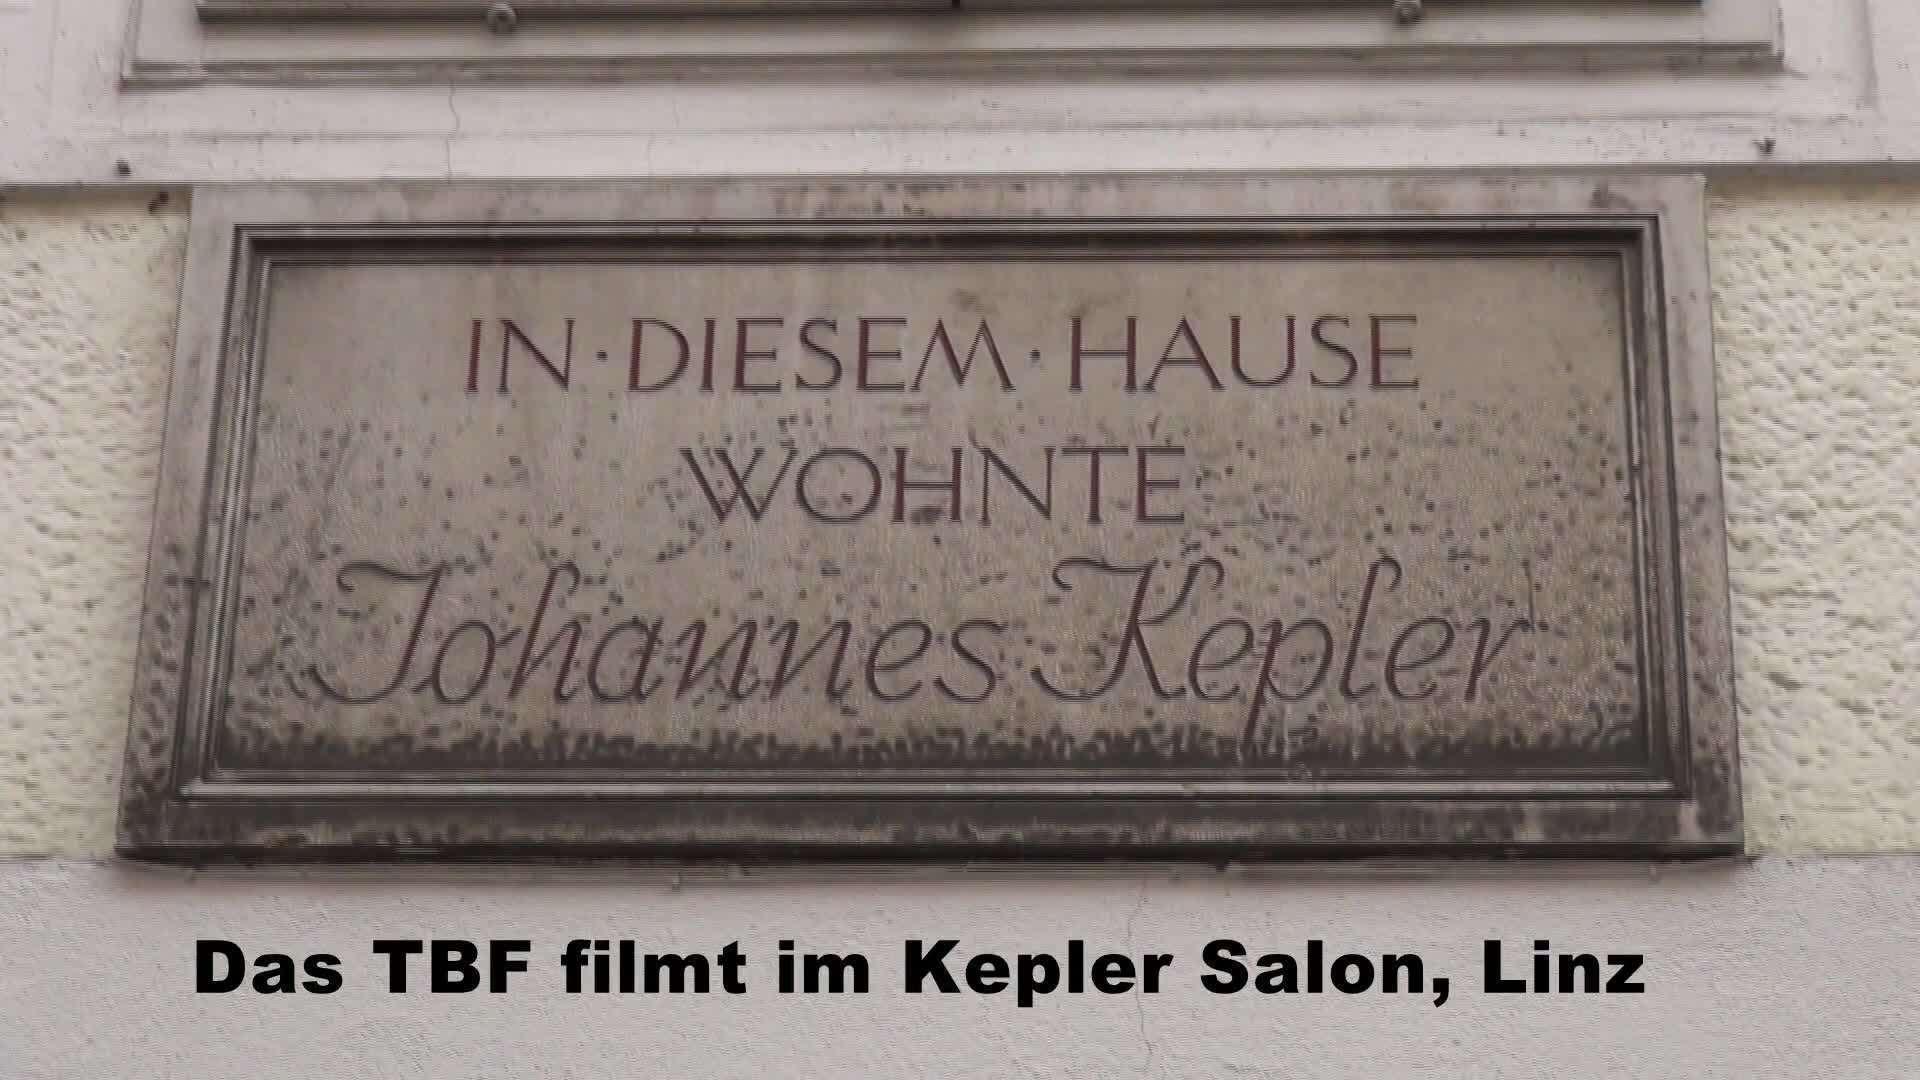 TBF filmt im Kepler Salon Linz